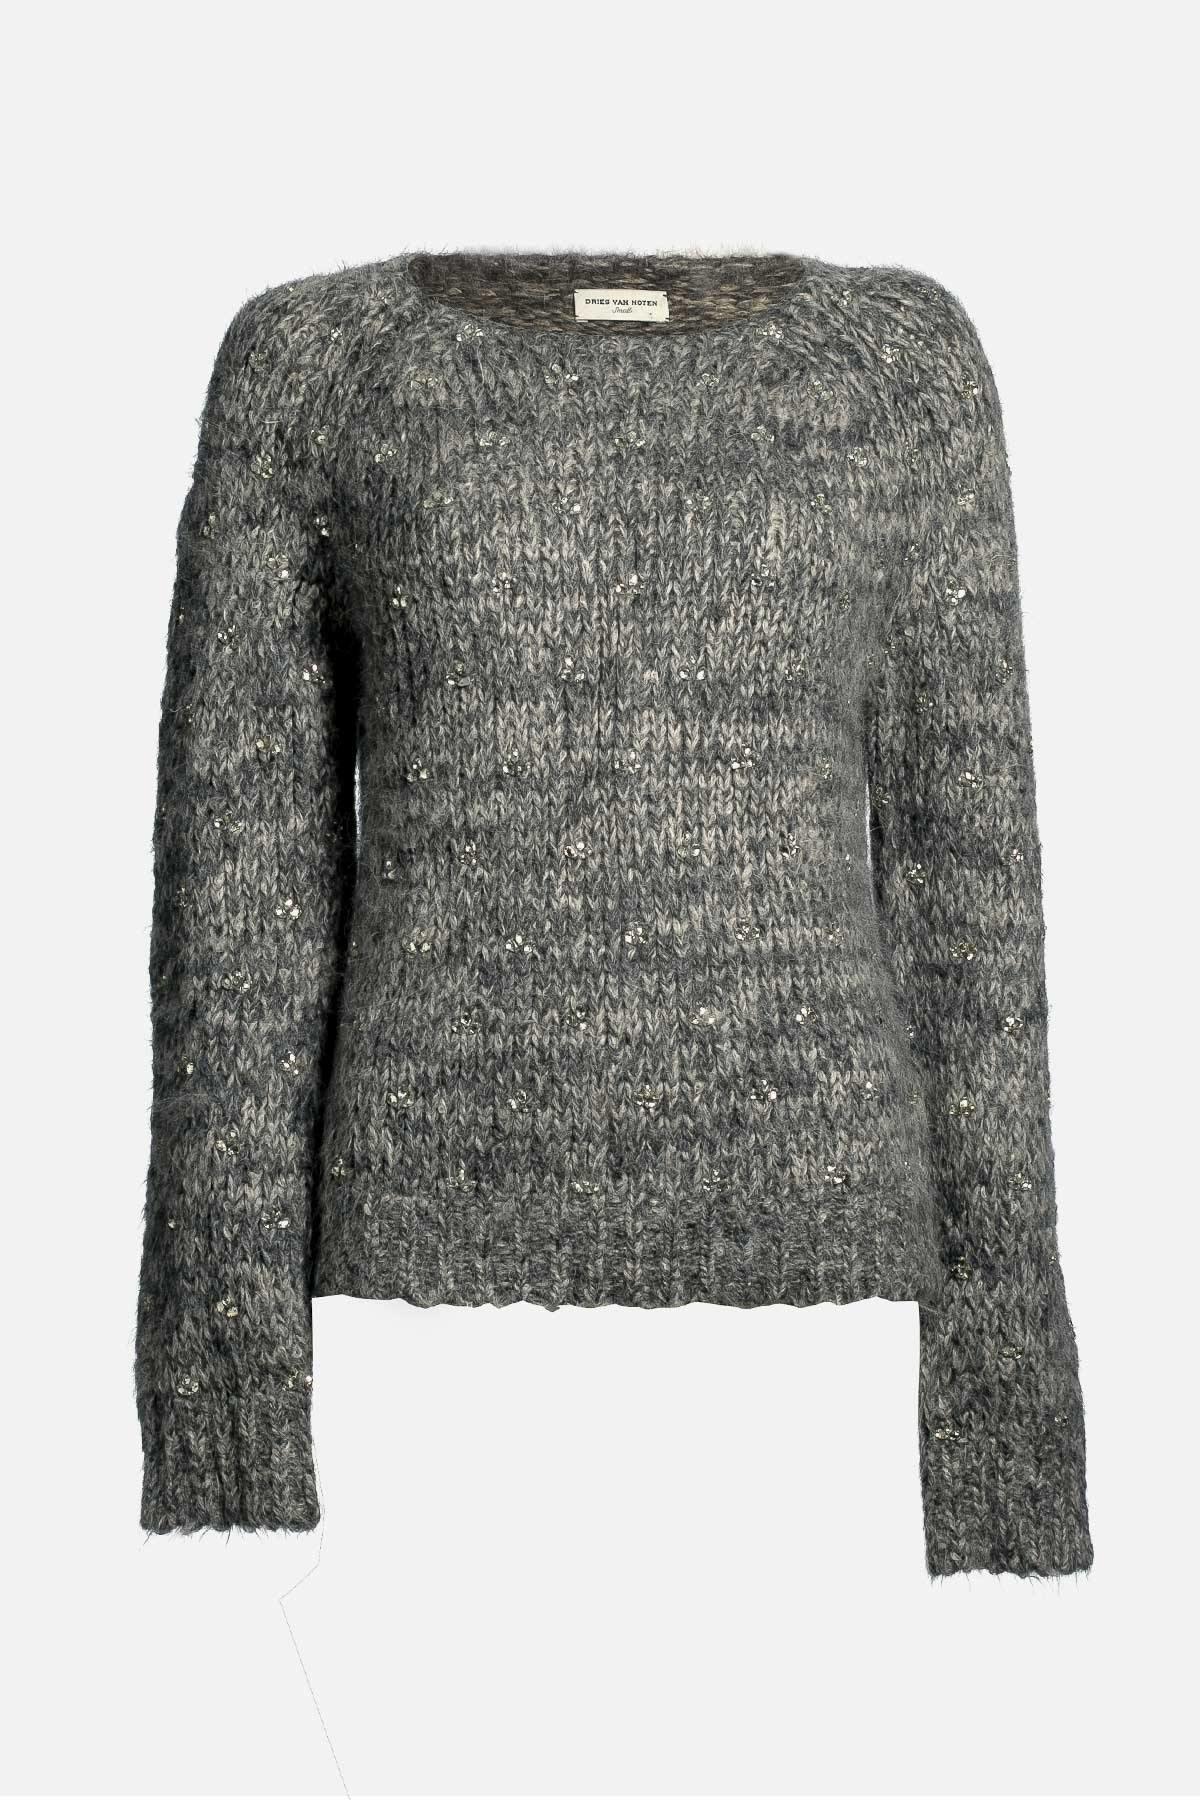 Tairana Alpaca Sweater